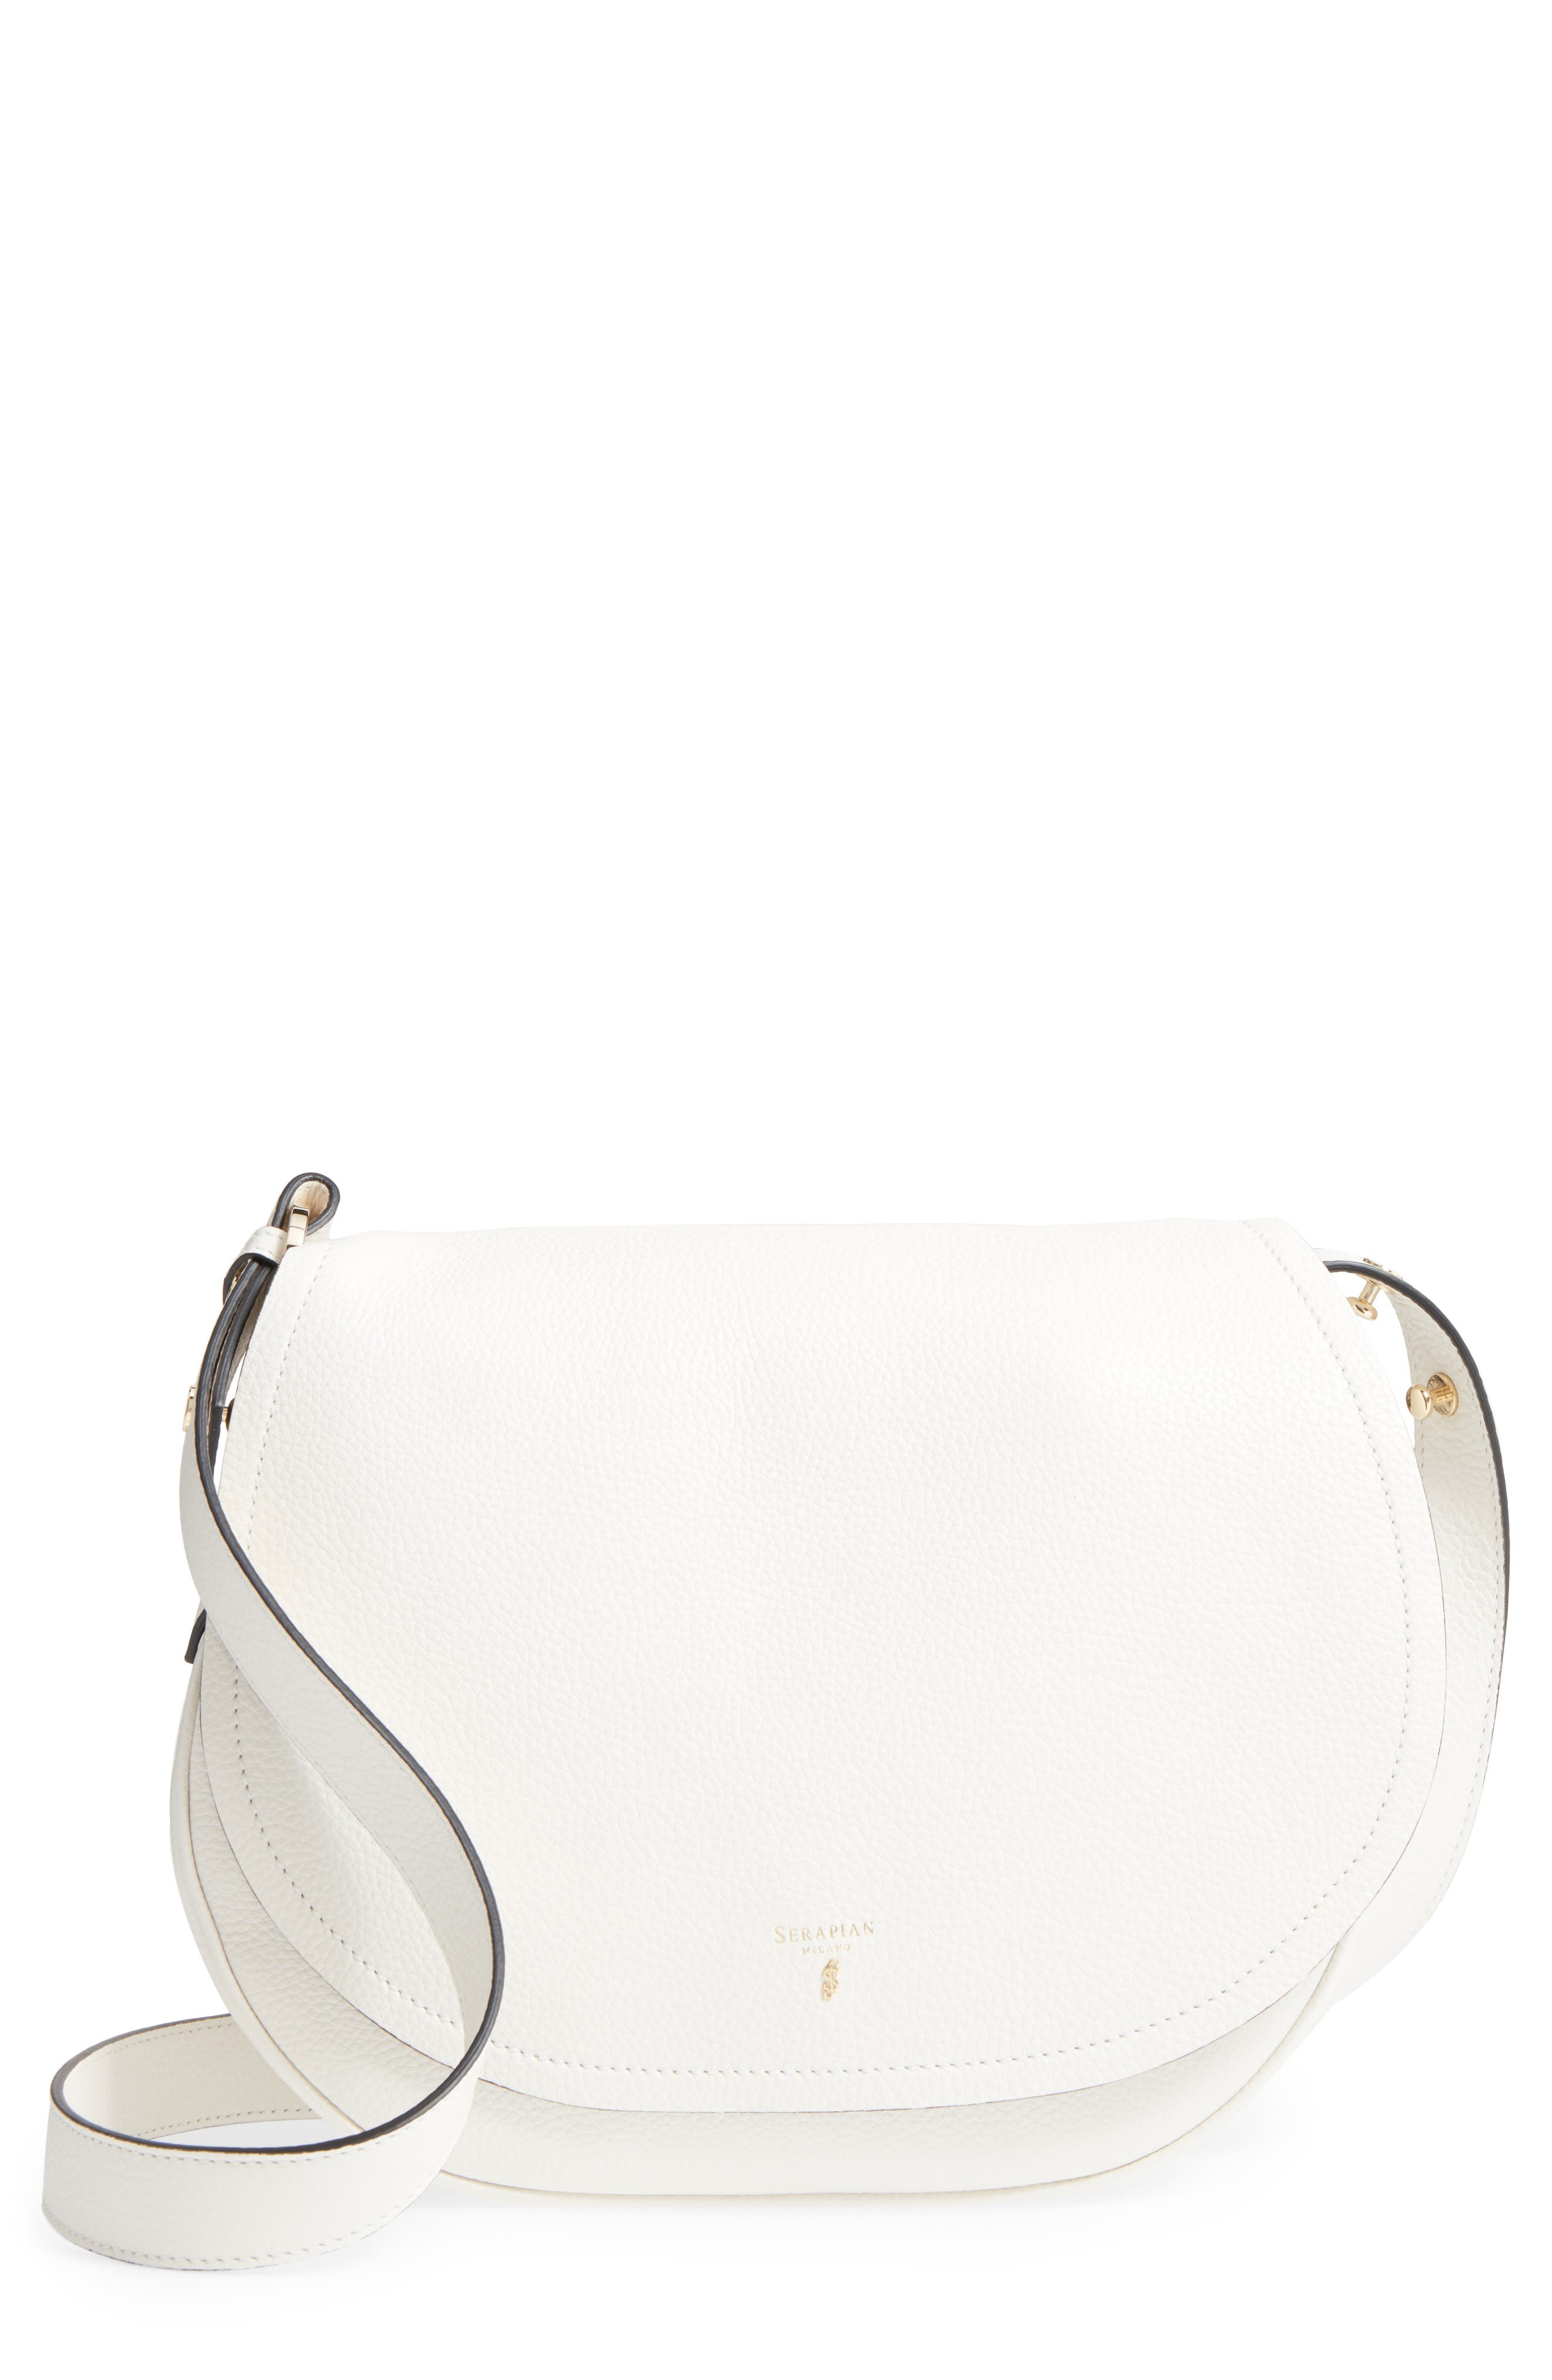 Serapian Milano Small Valeria Leather Crossbody Bag